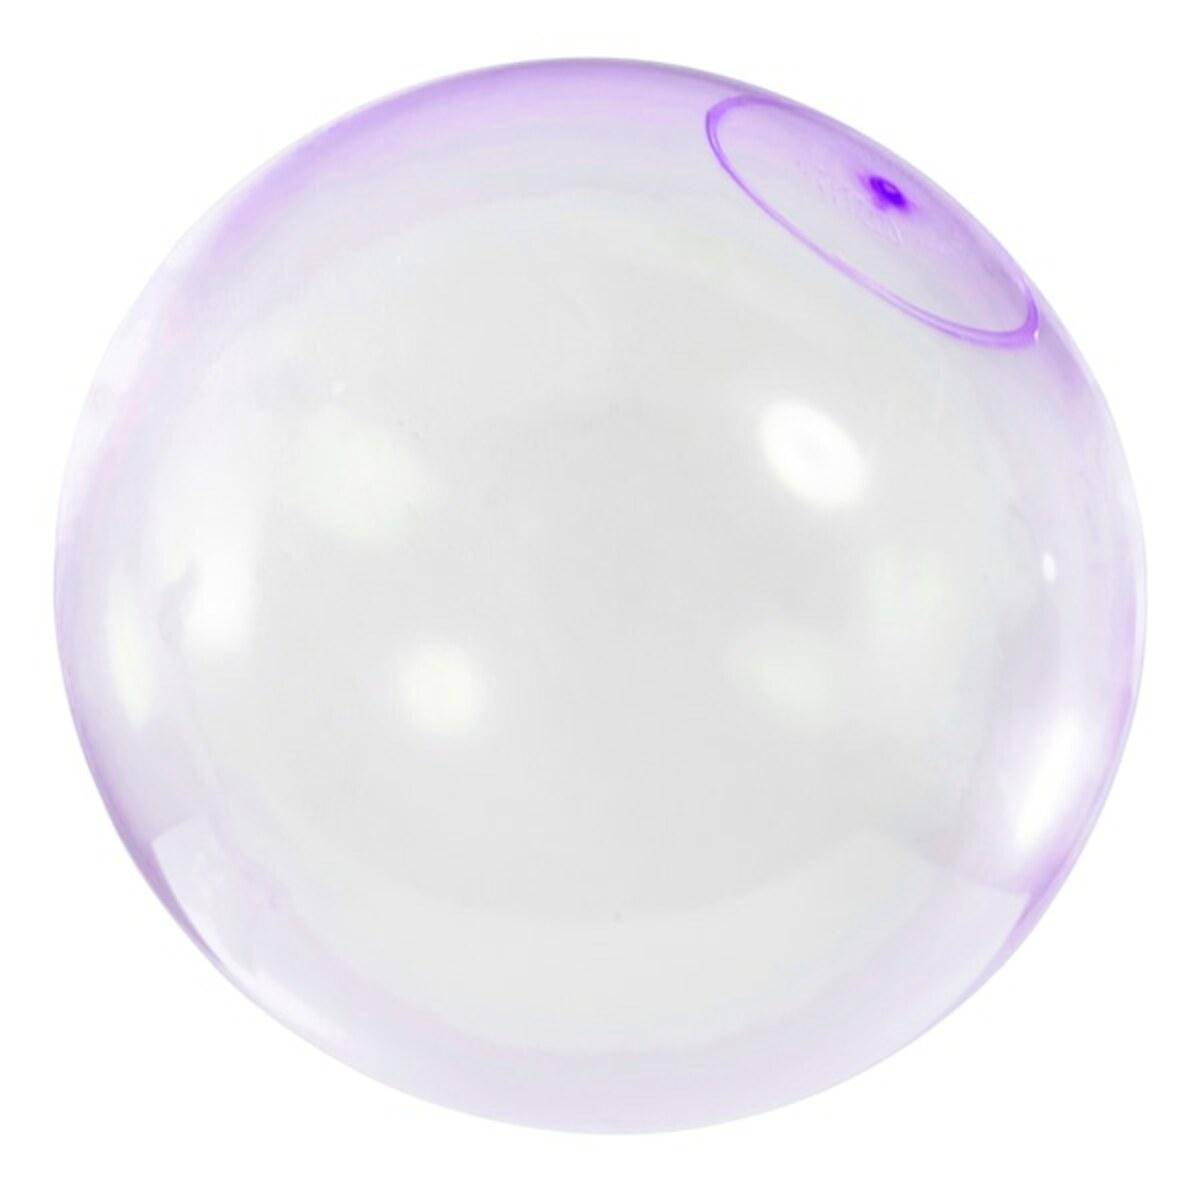 Bild 4 von Vivid - Super Wubble Bubble Ball mit Pumpe, sortiert